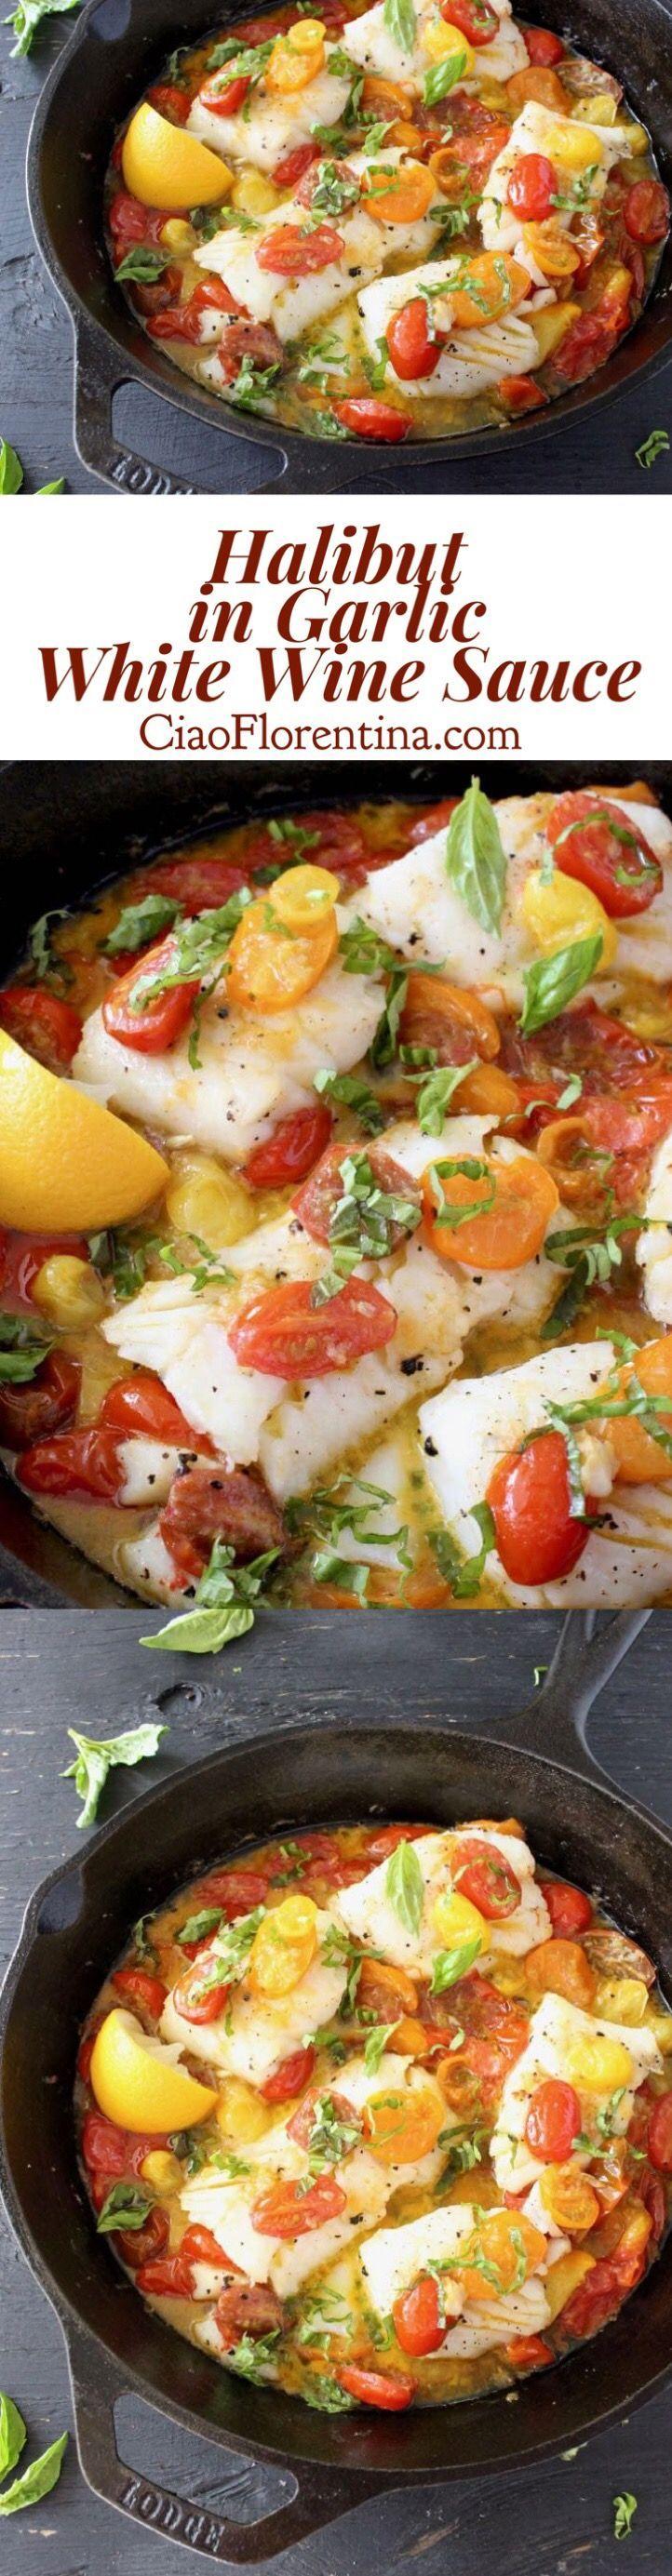 Pan Seared Halibut in Lemon Garlic White Wine Sauce Recipe | http://CiaoFlorentina.com @CiaoFlorentina